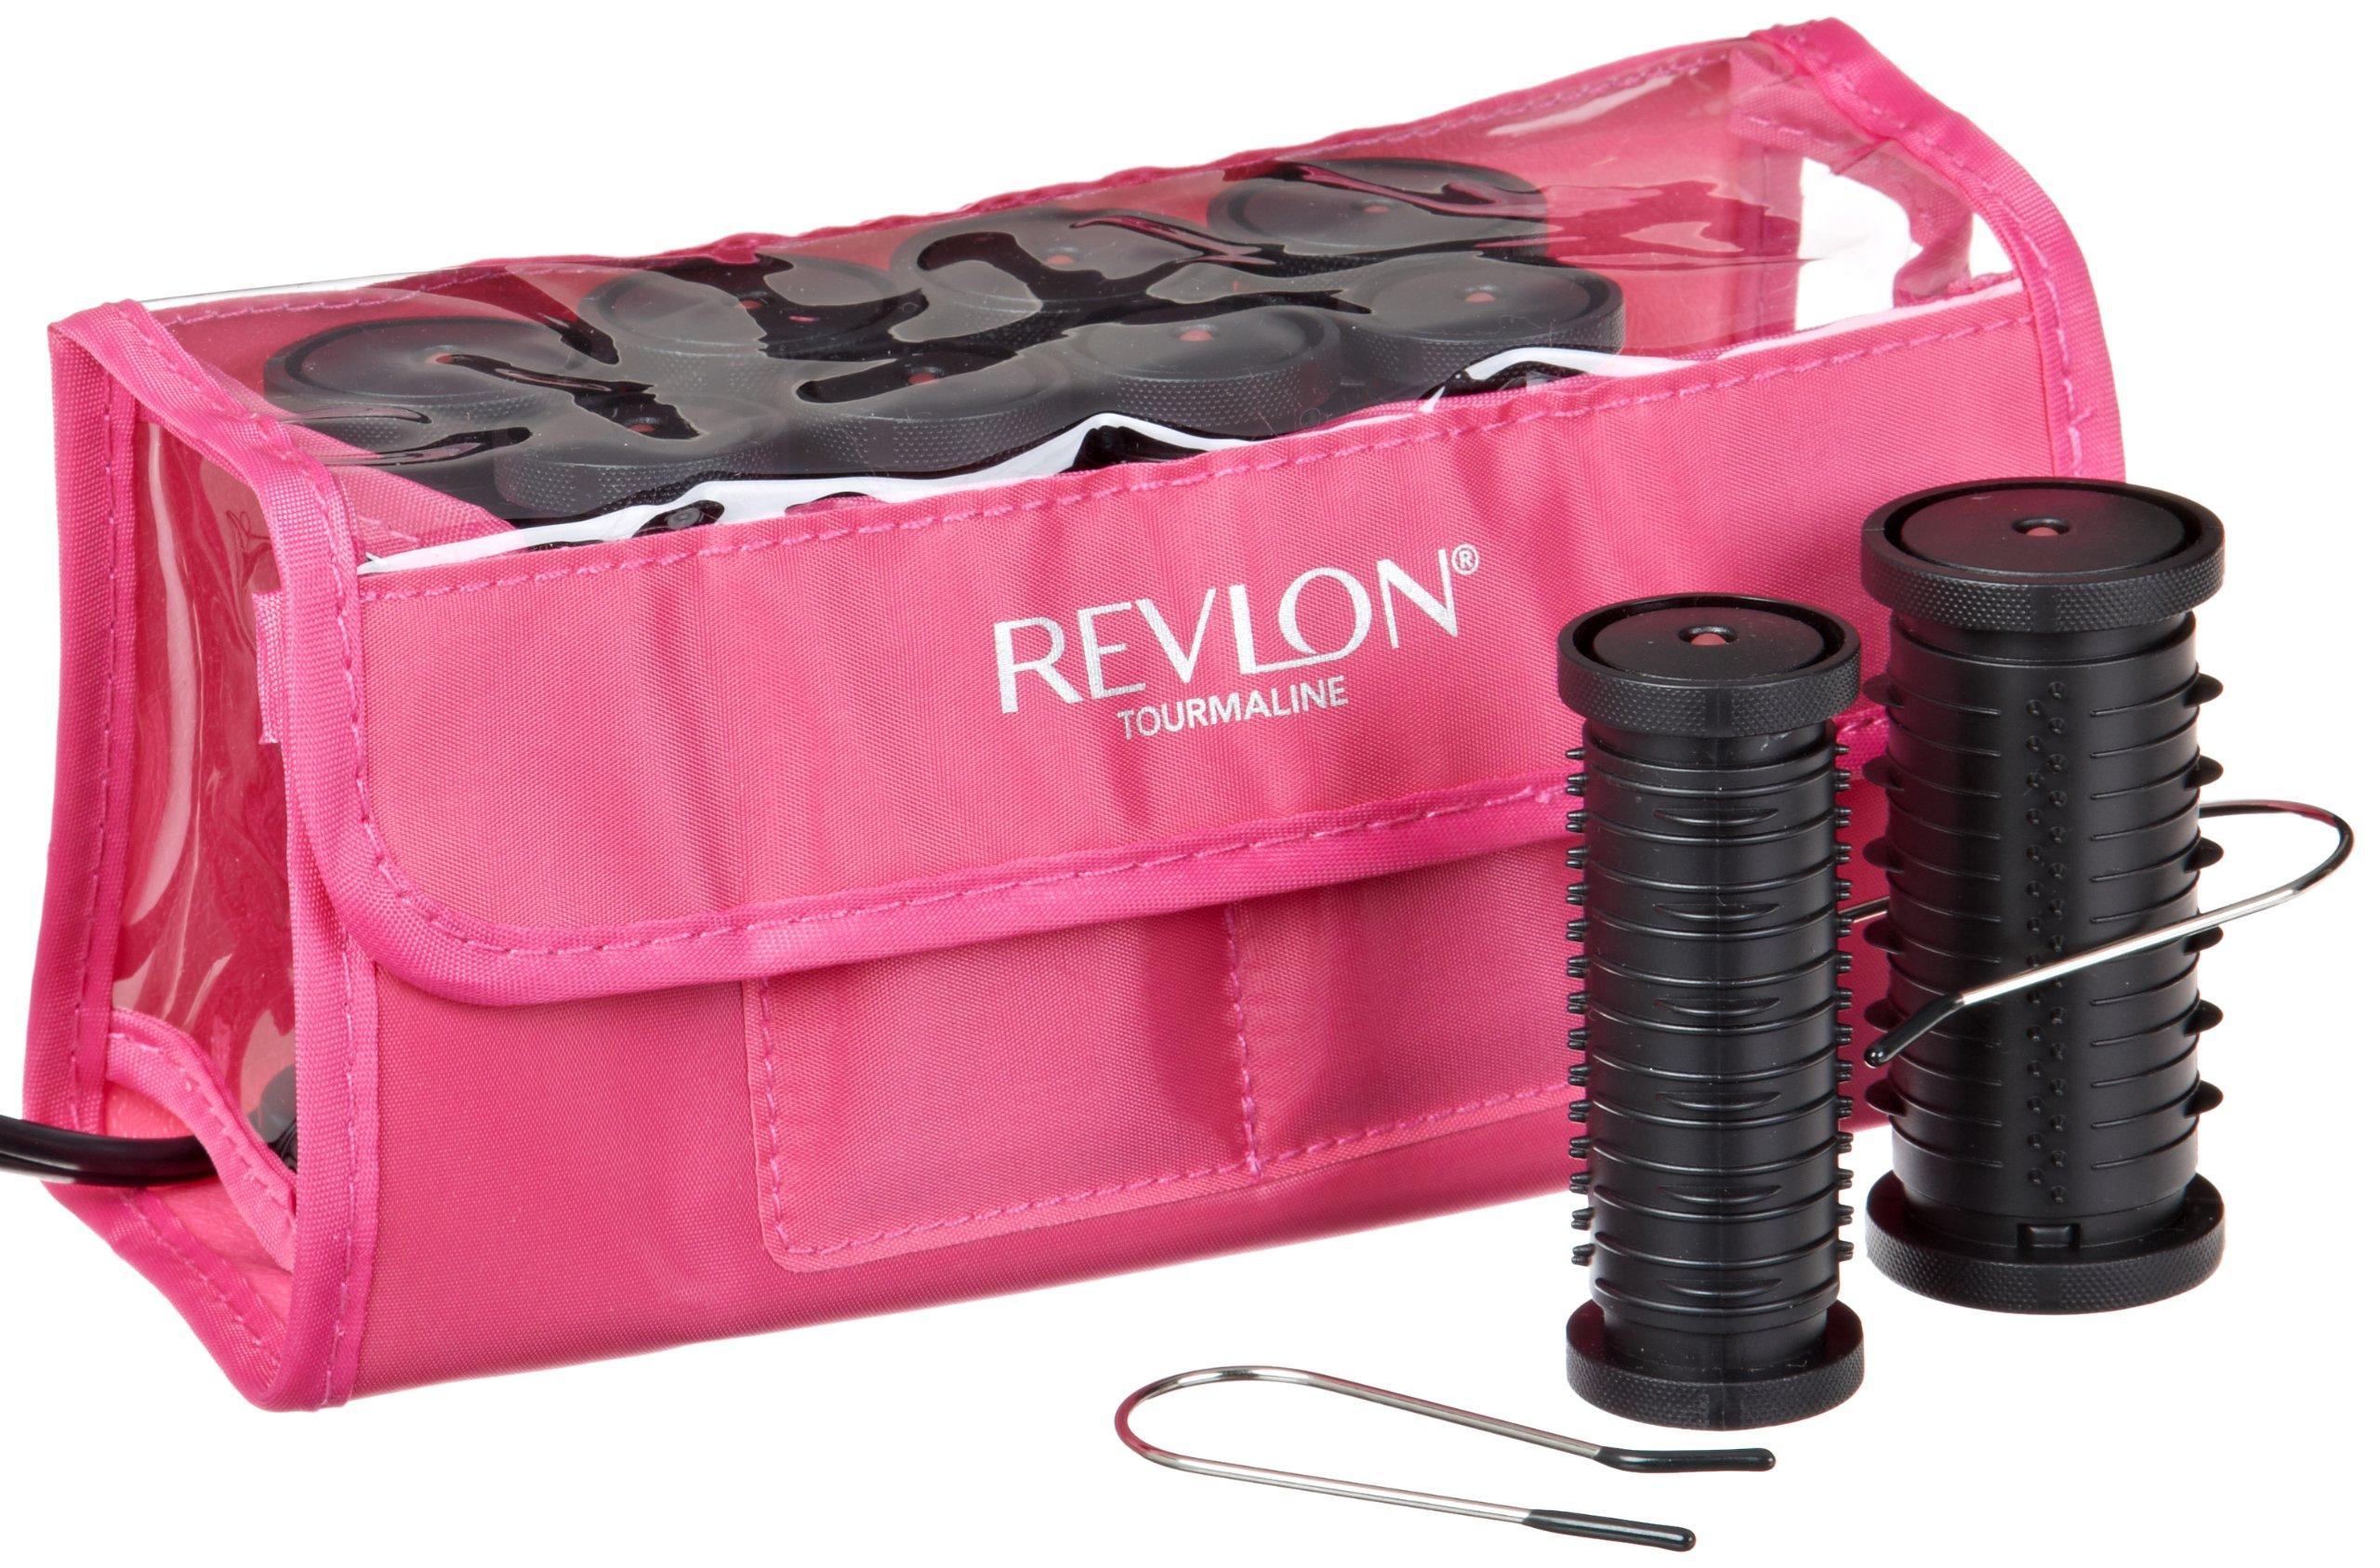 Revlon Curls Piece Travel Rollers